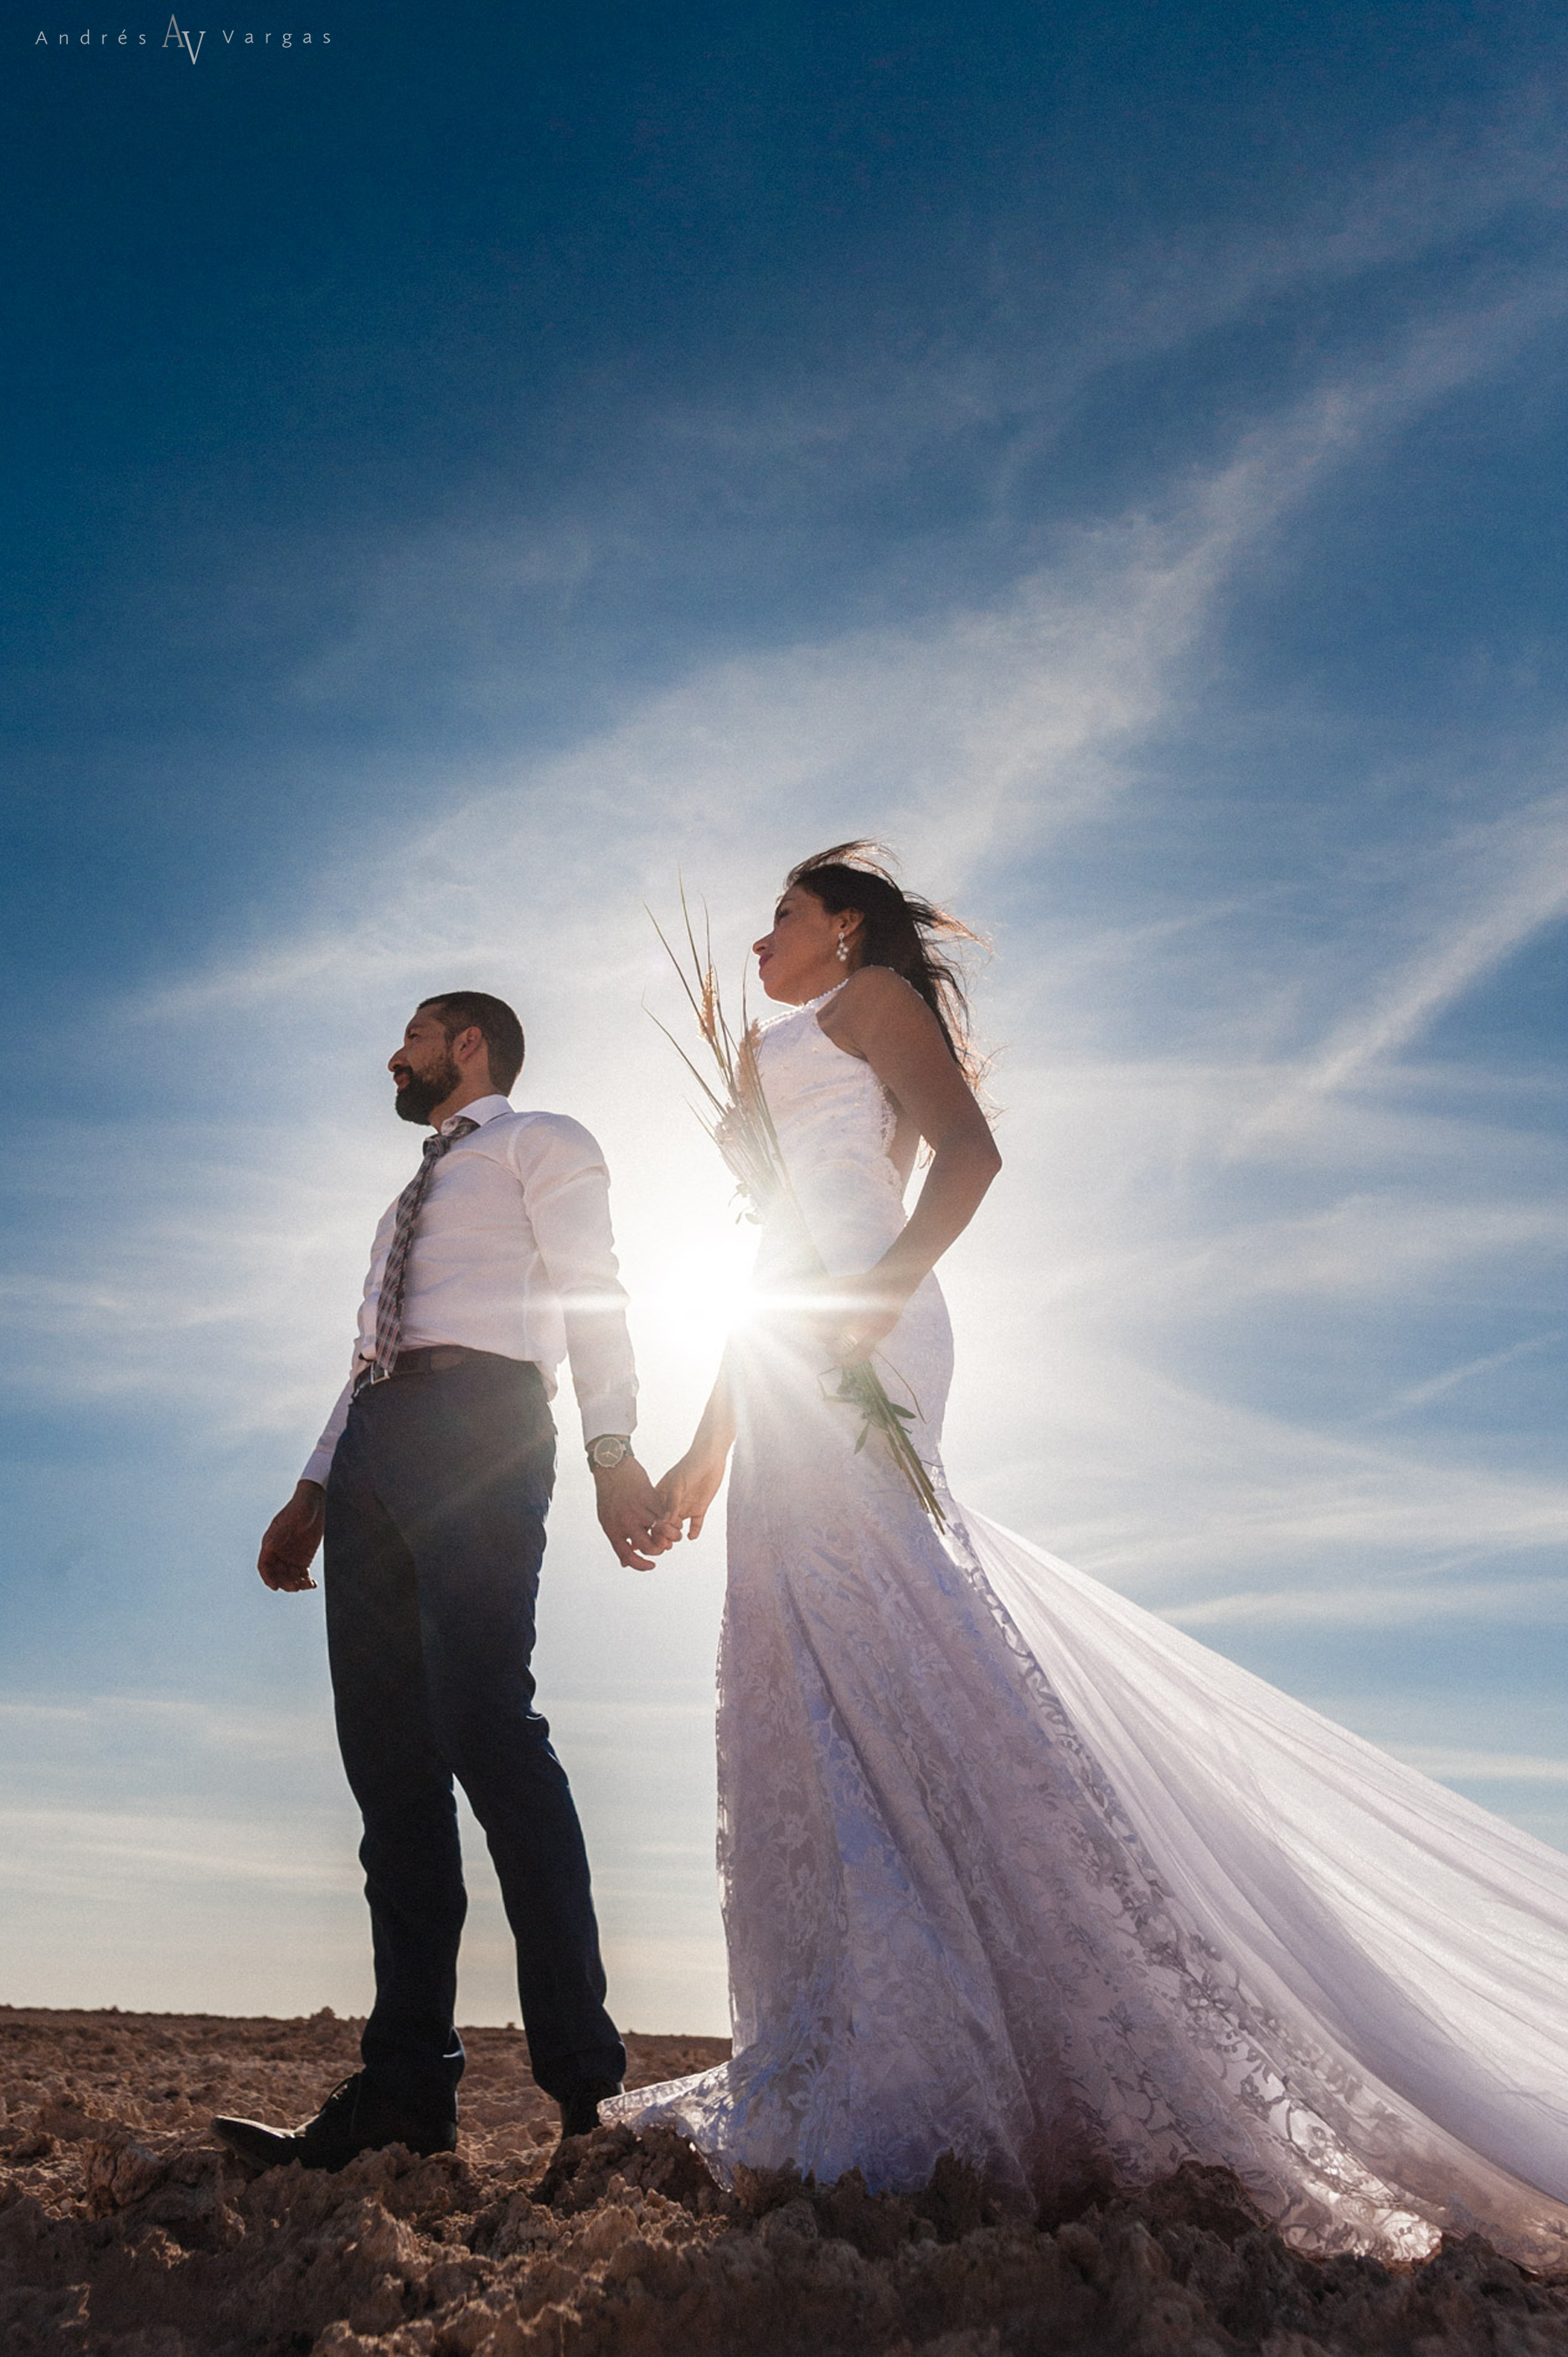 Matrimonio Mixto Catolico Ortodoxo : Paloma sergio salar de atacama andrés vargas fotógrafo